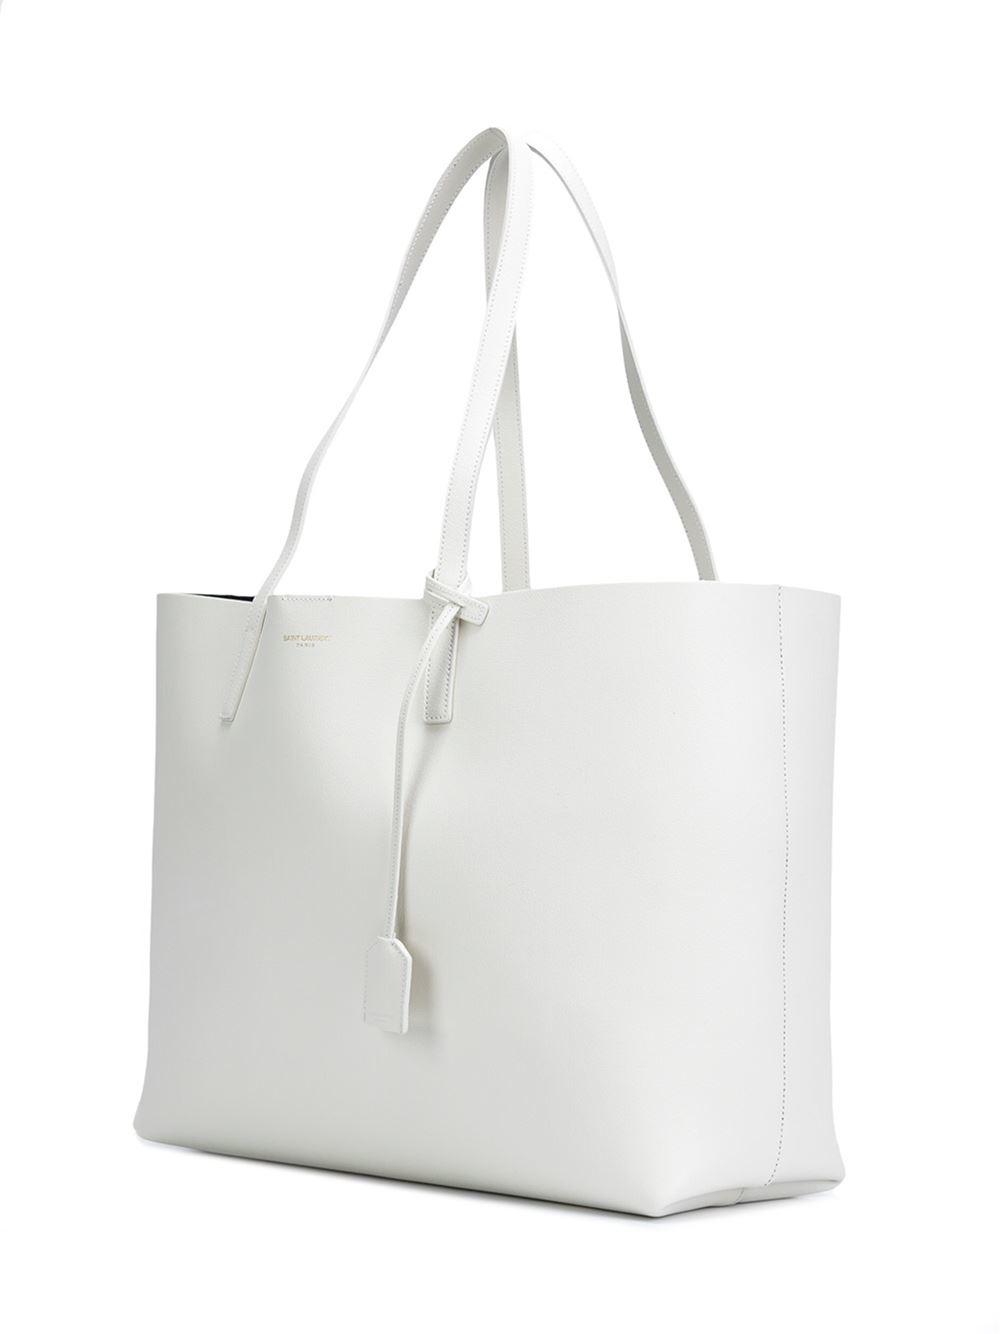 saint laurent large shopper tote in white lyst. Black Bedroom Furniture Sets. Home Design Ideas